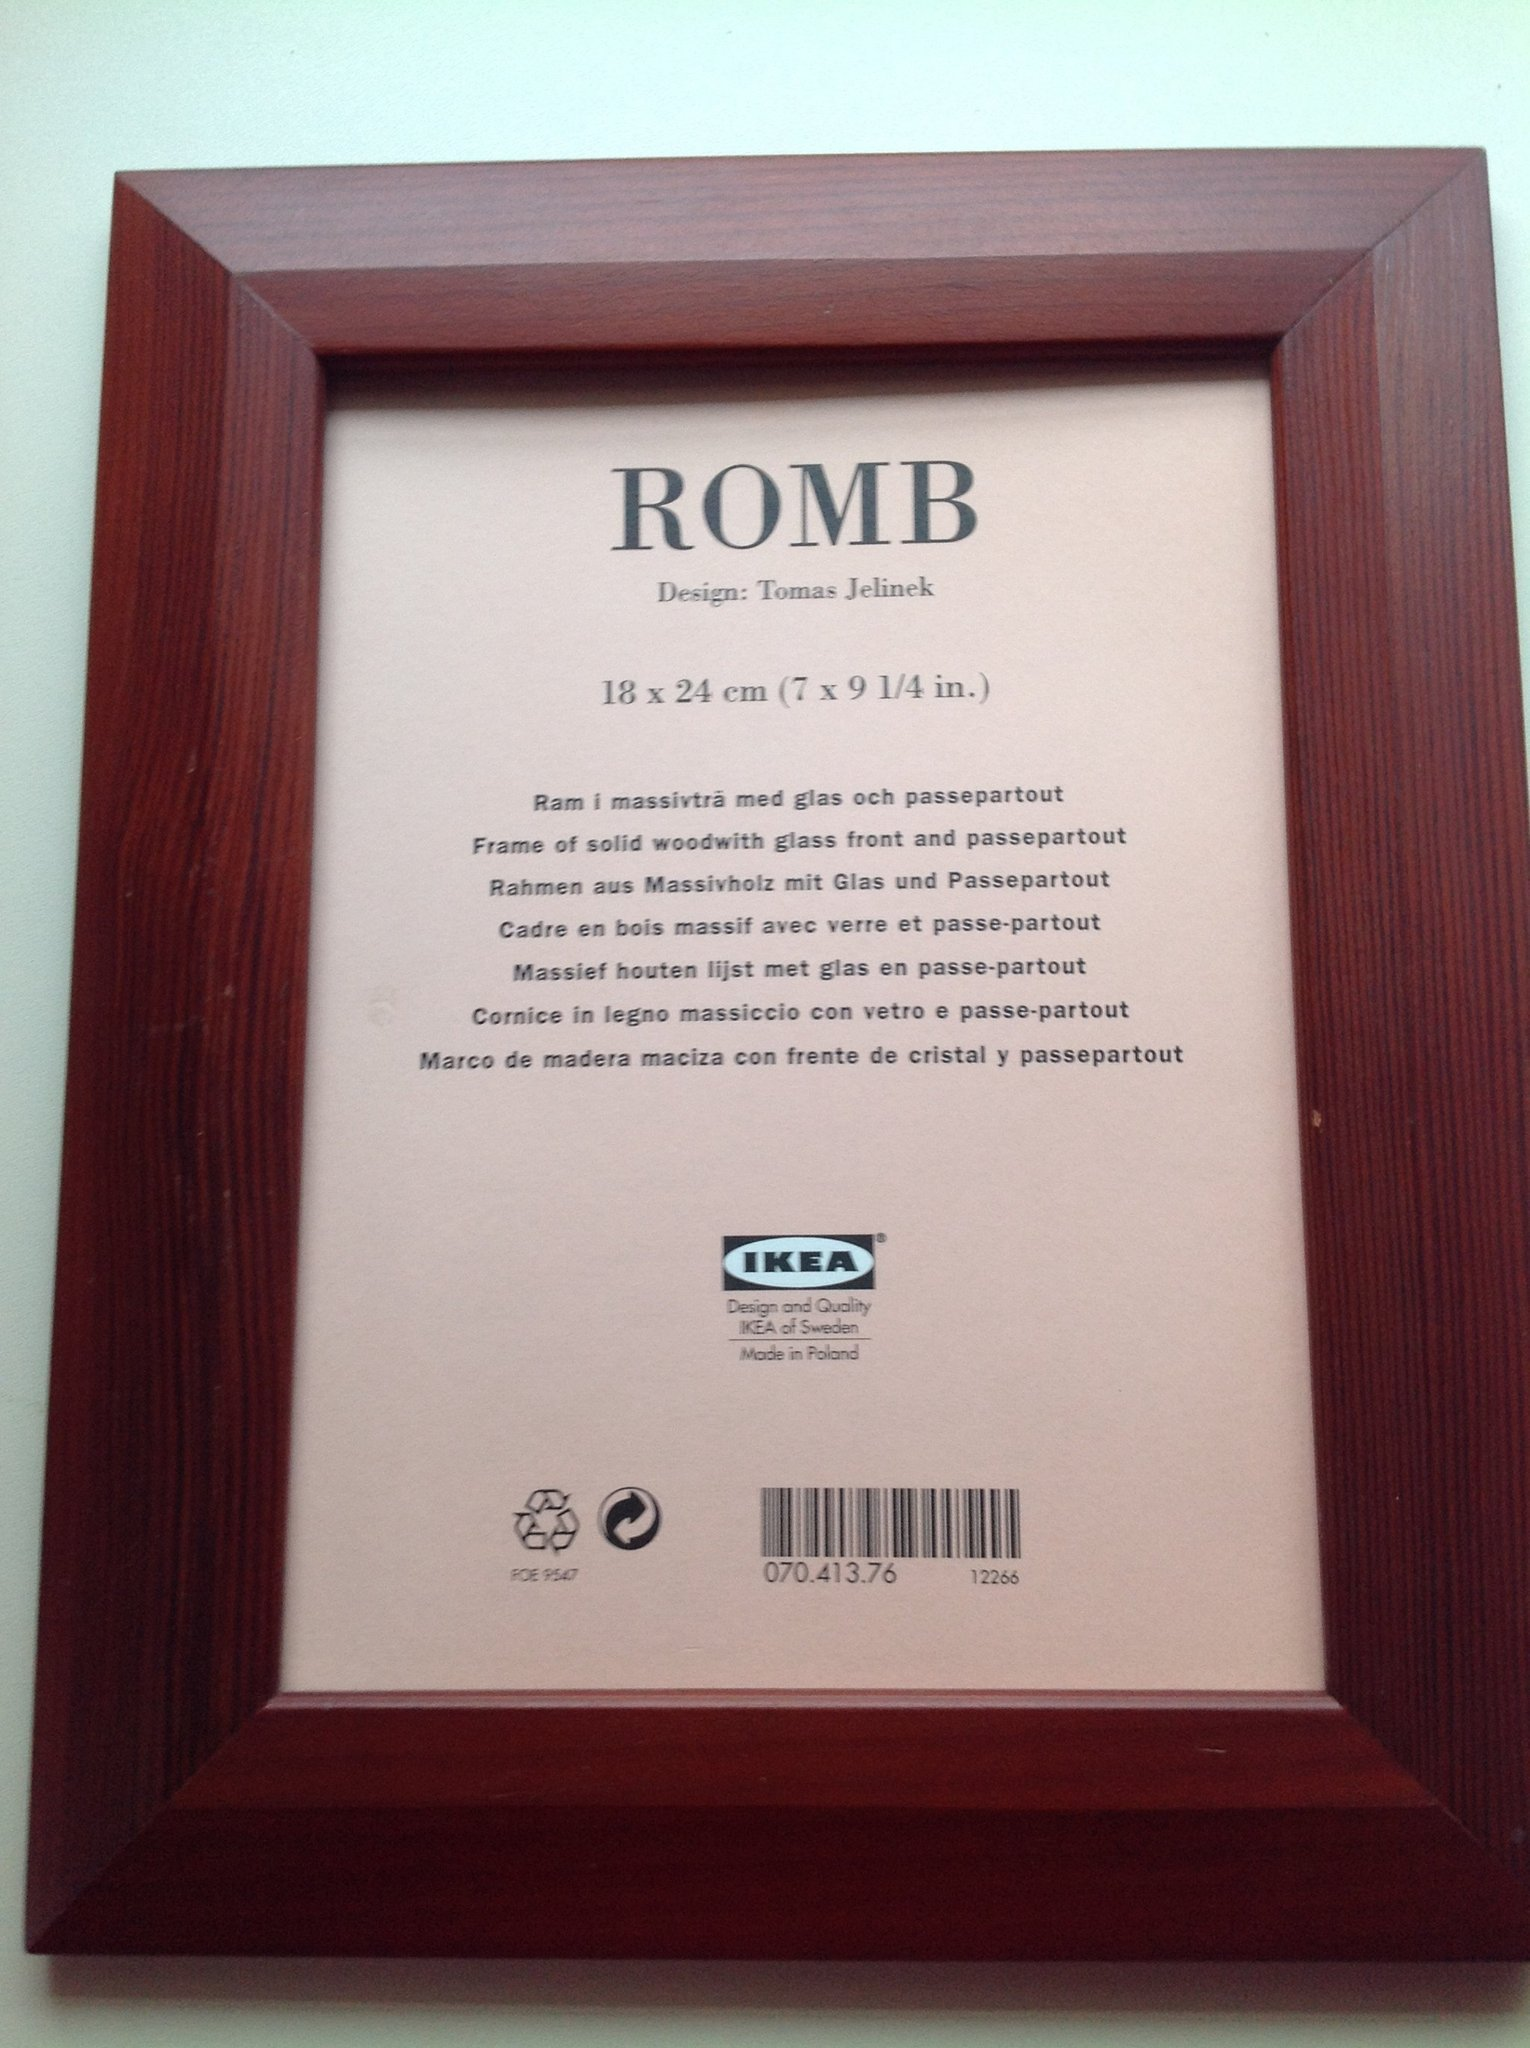 "In Legno Wood Design ikea retro/vintage foto ram i massivtrÄ ""romb"" design tomas jelinek 18 x 24  cm"